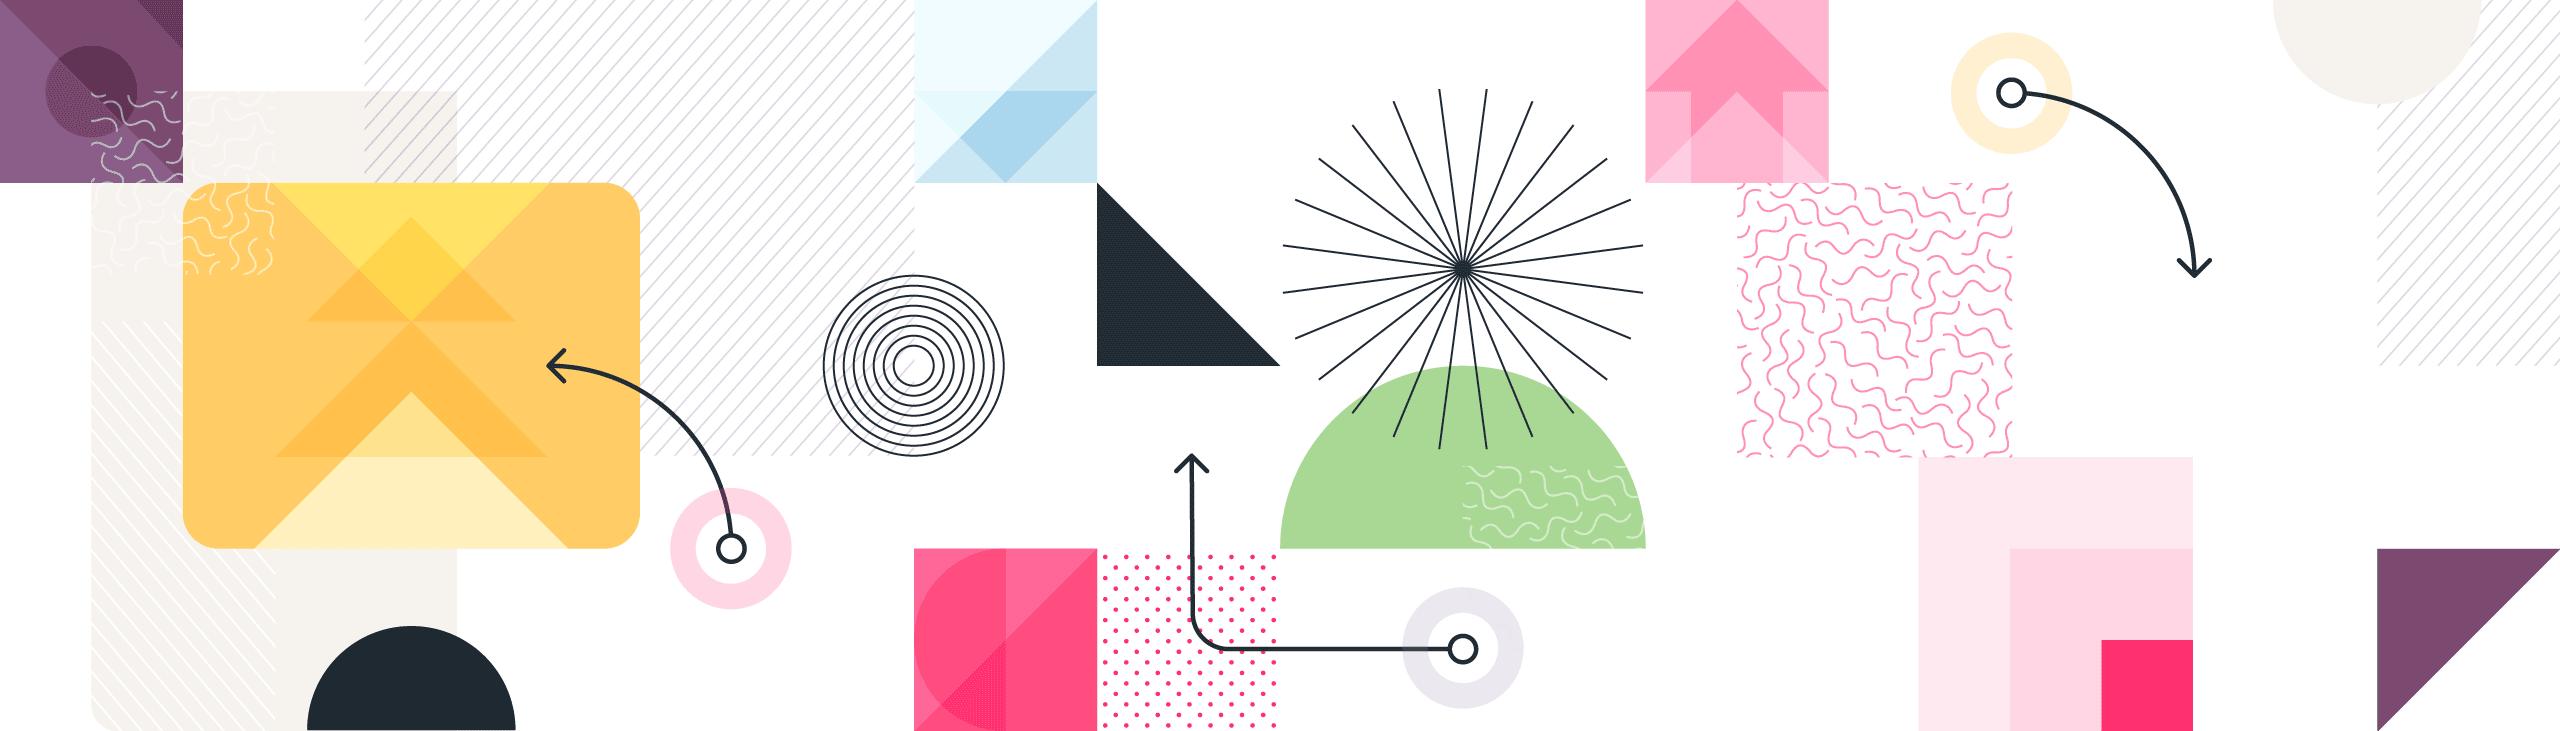 Geometrical banner